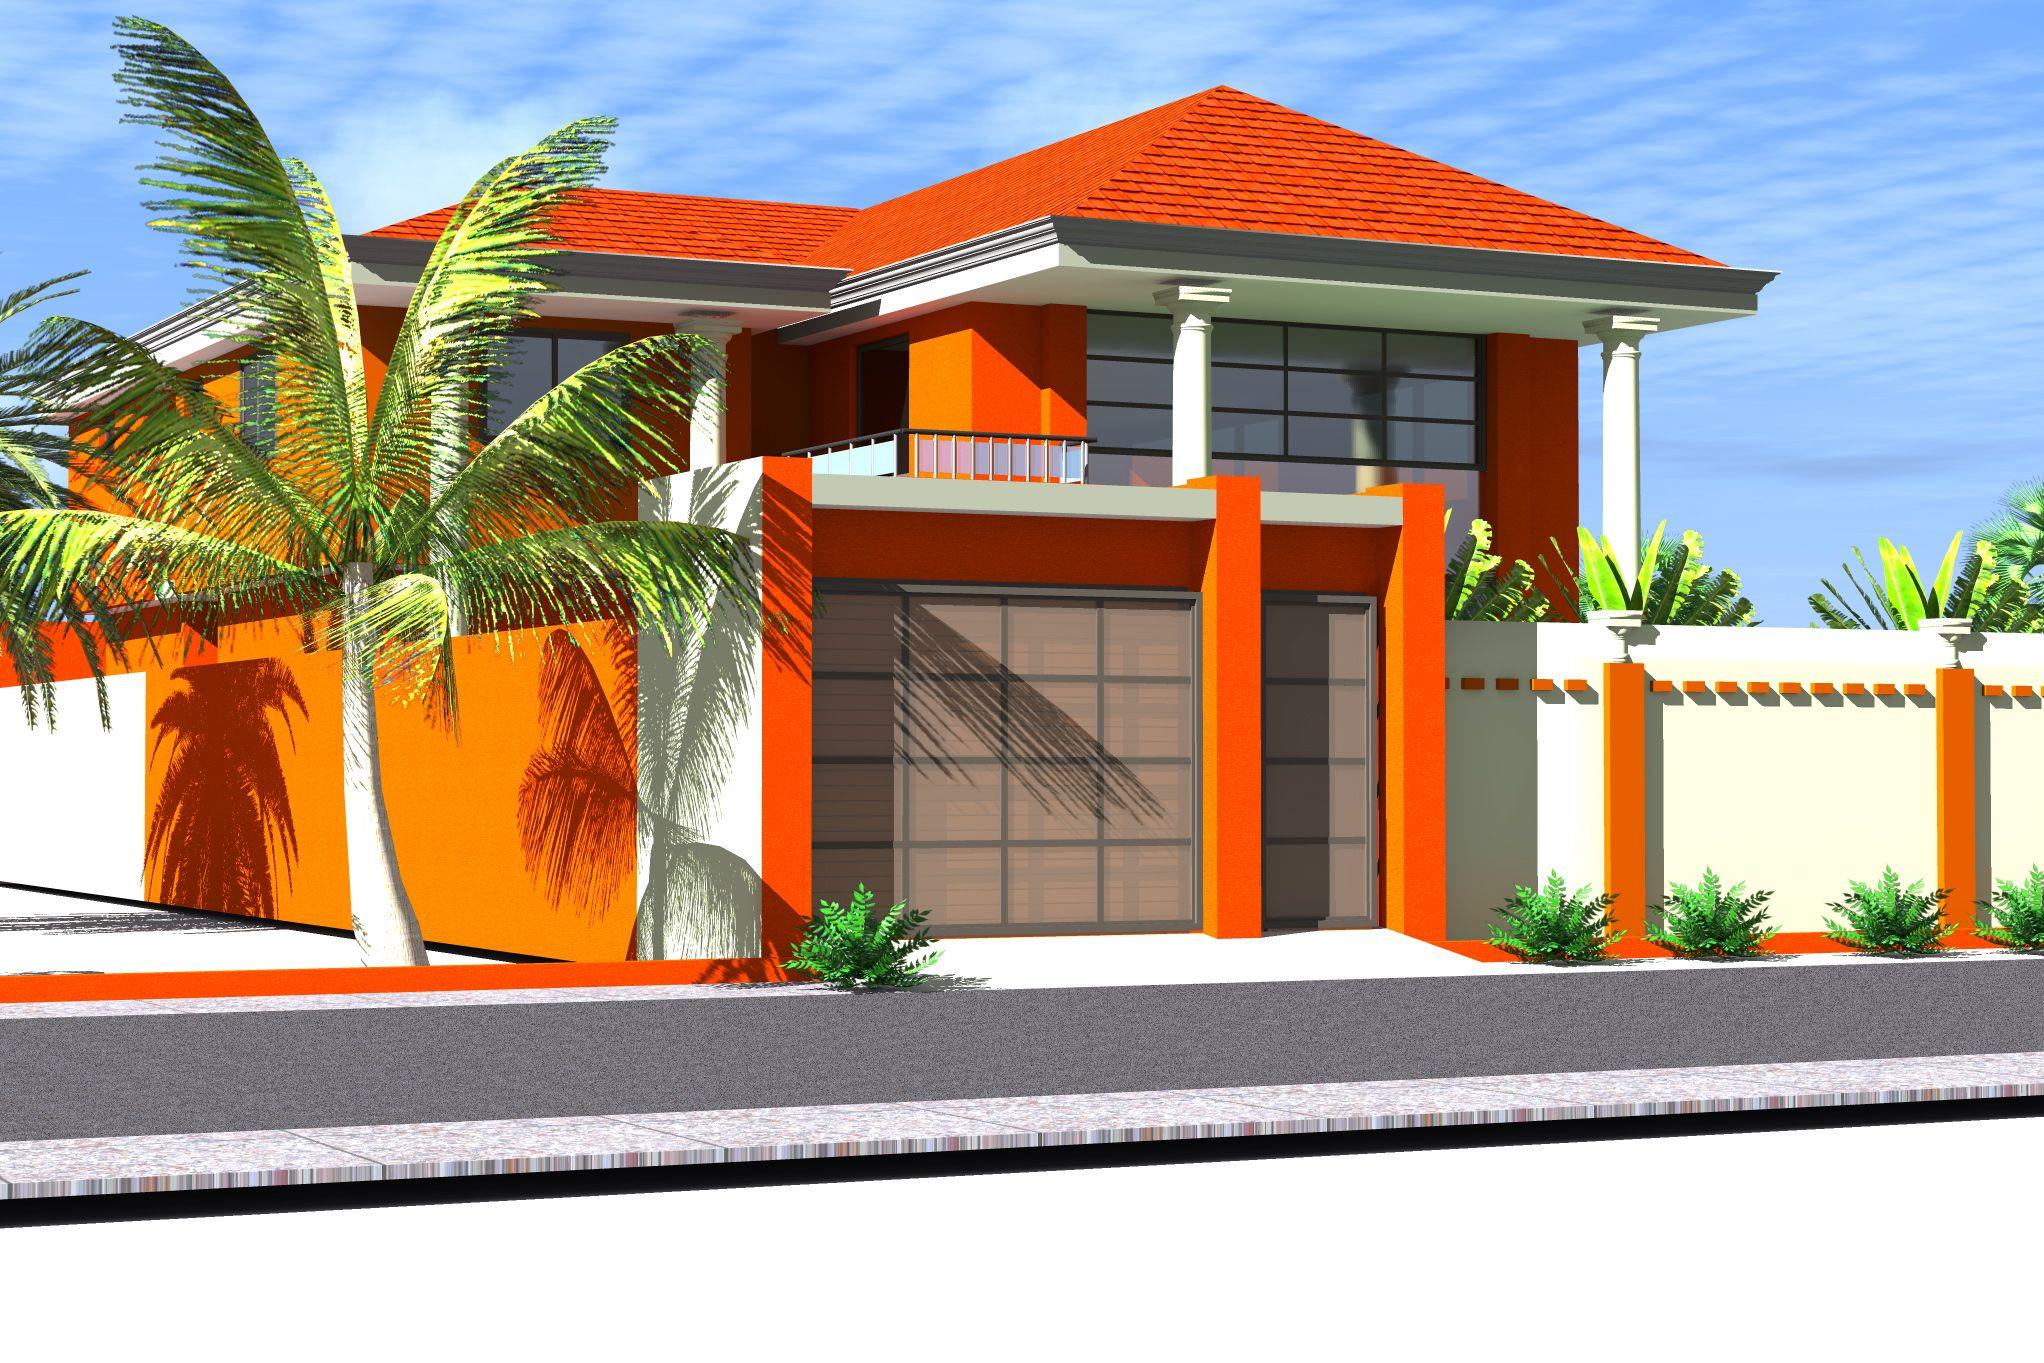 guinee conakry villa proposal. Black Bedroom Furniture Sets. Home Design Ideas